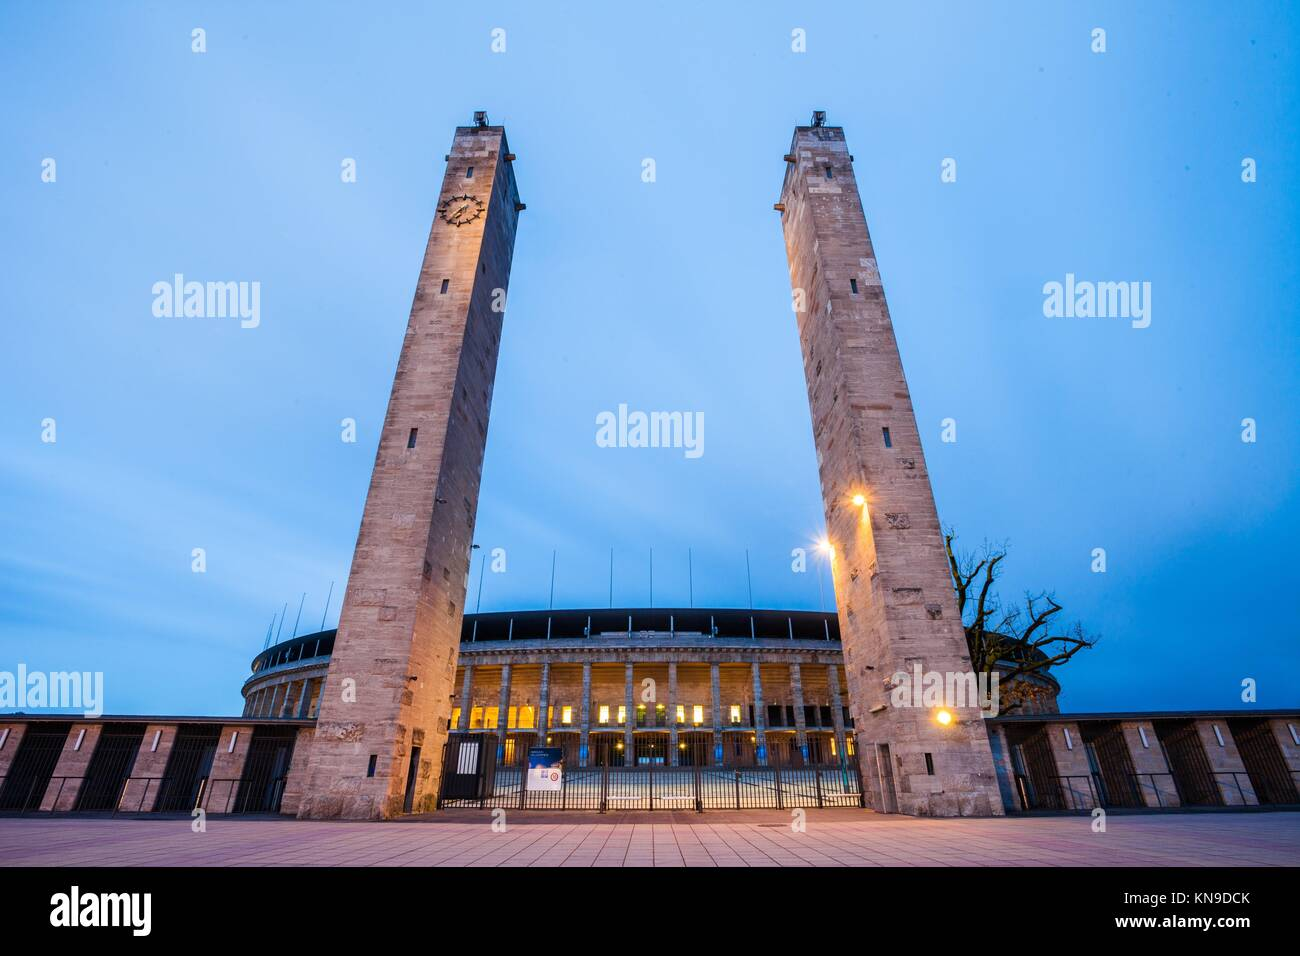 Berlin's Olympiastadion seen at twilight. - Stock Image